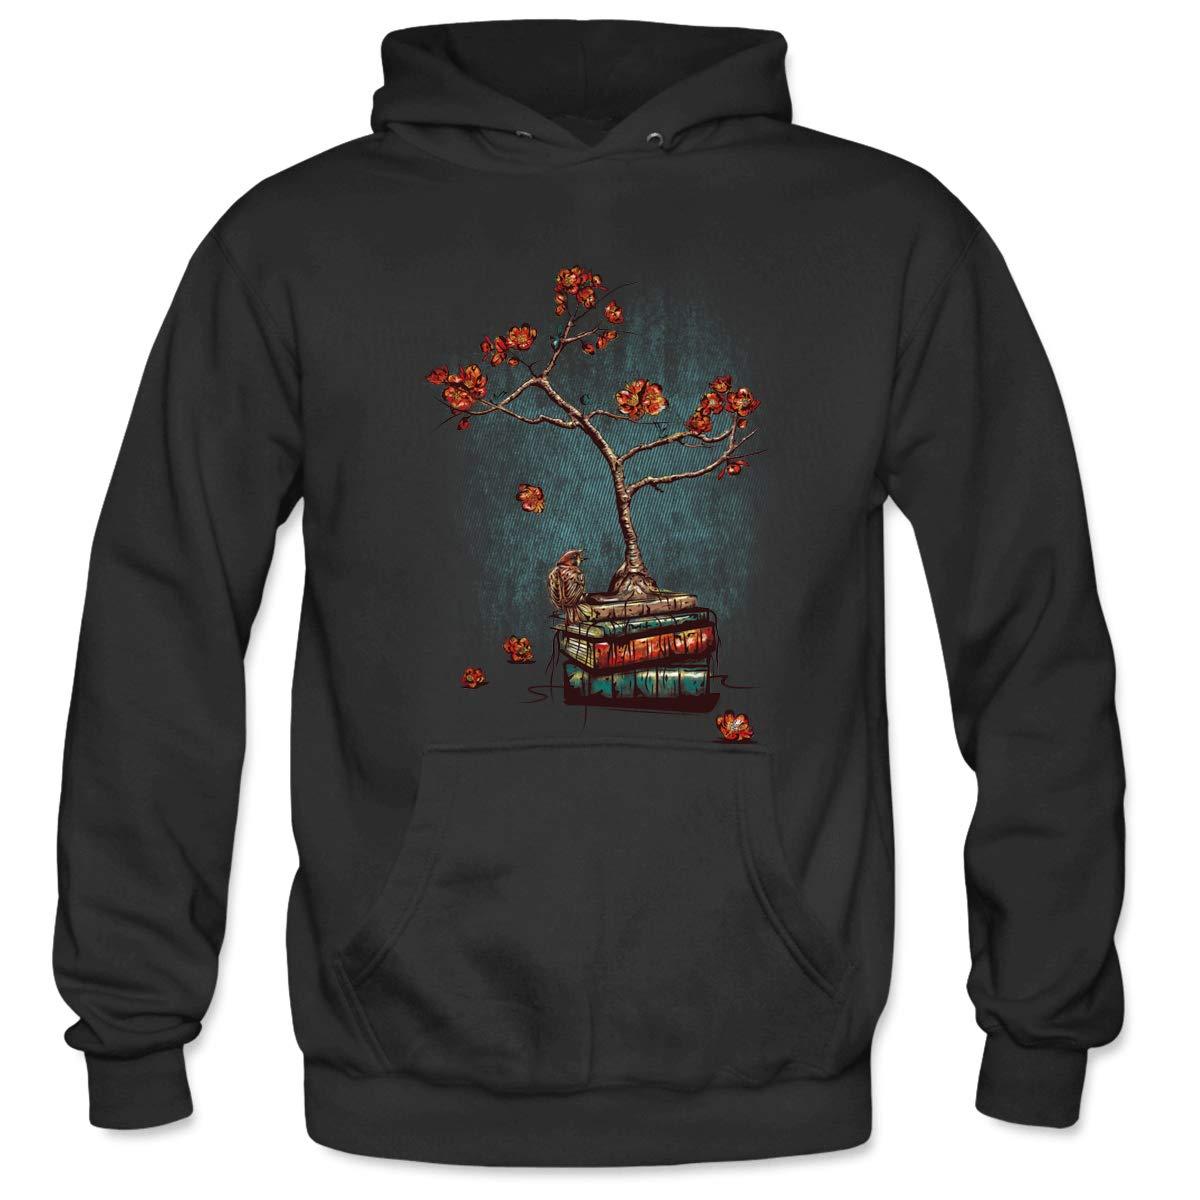 Mens Re Born Hooded Sweatshirt Funny Printed Pullover Hoodies Classic Long Sleeve T Shirt Tops